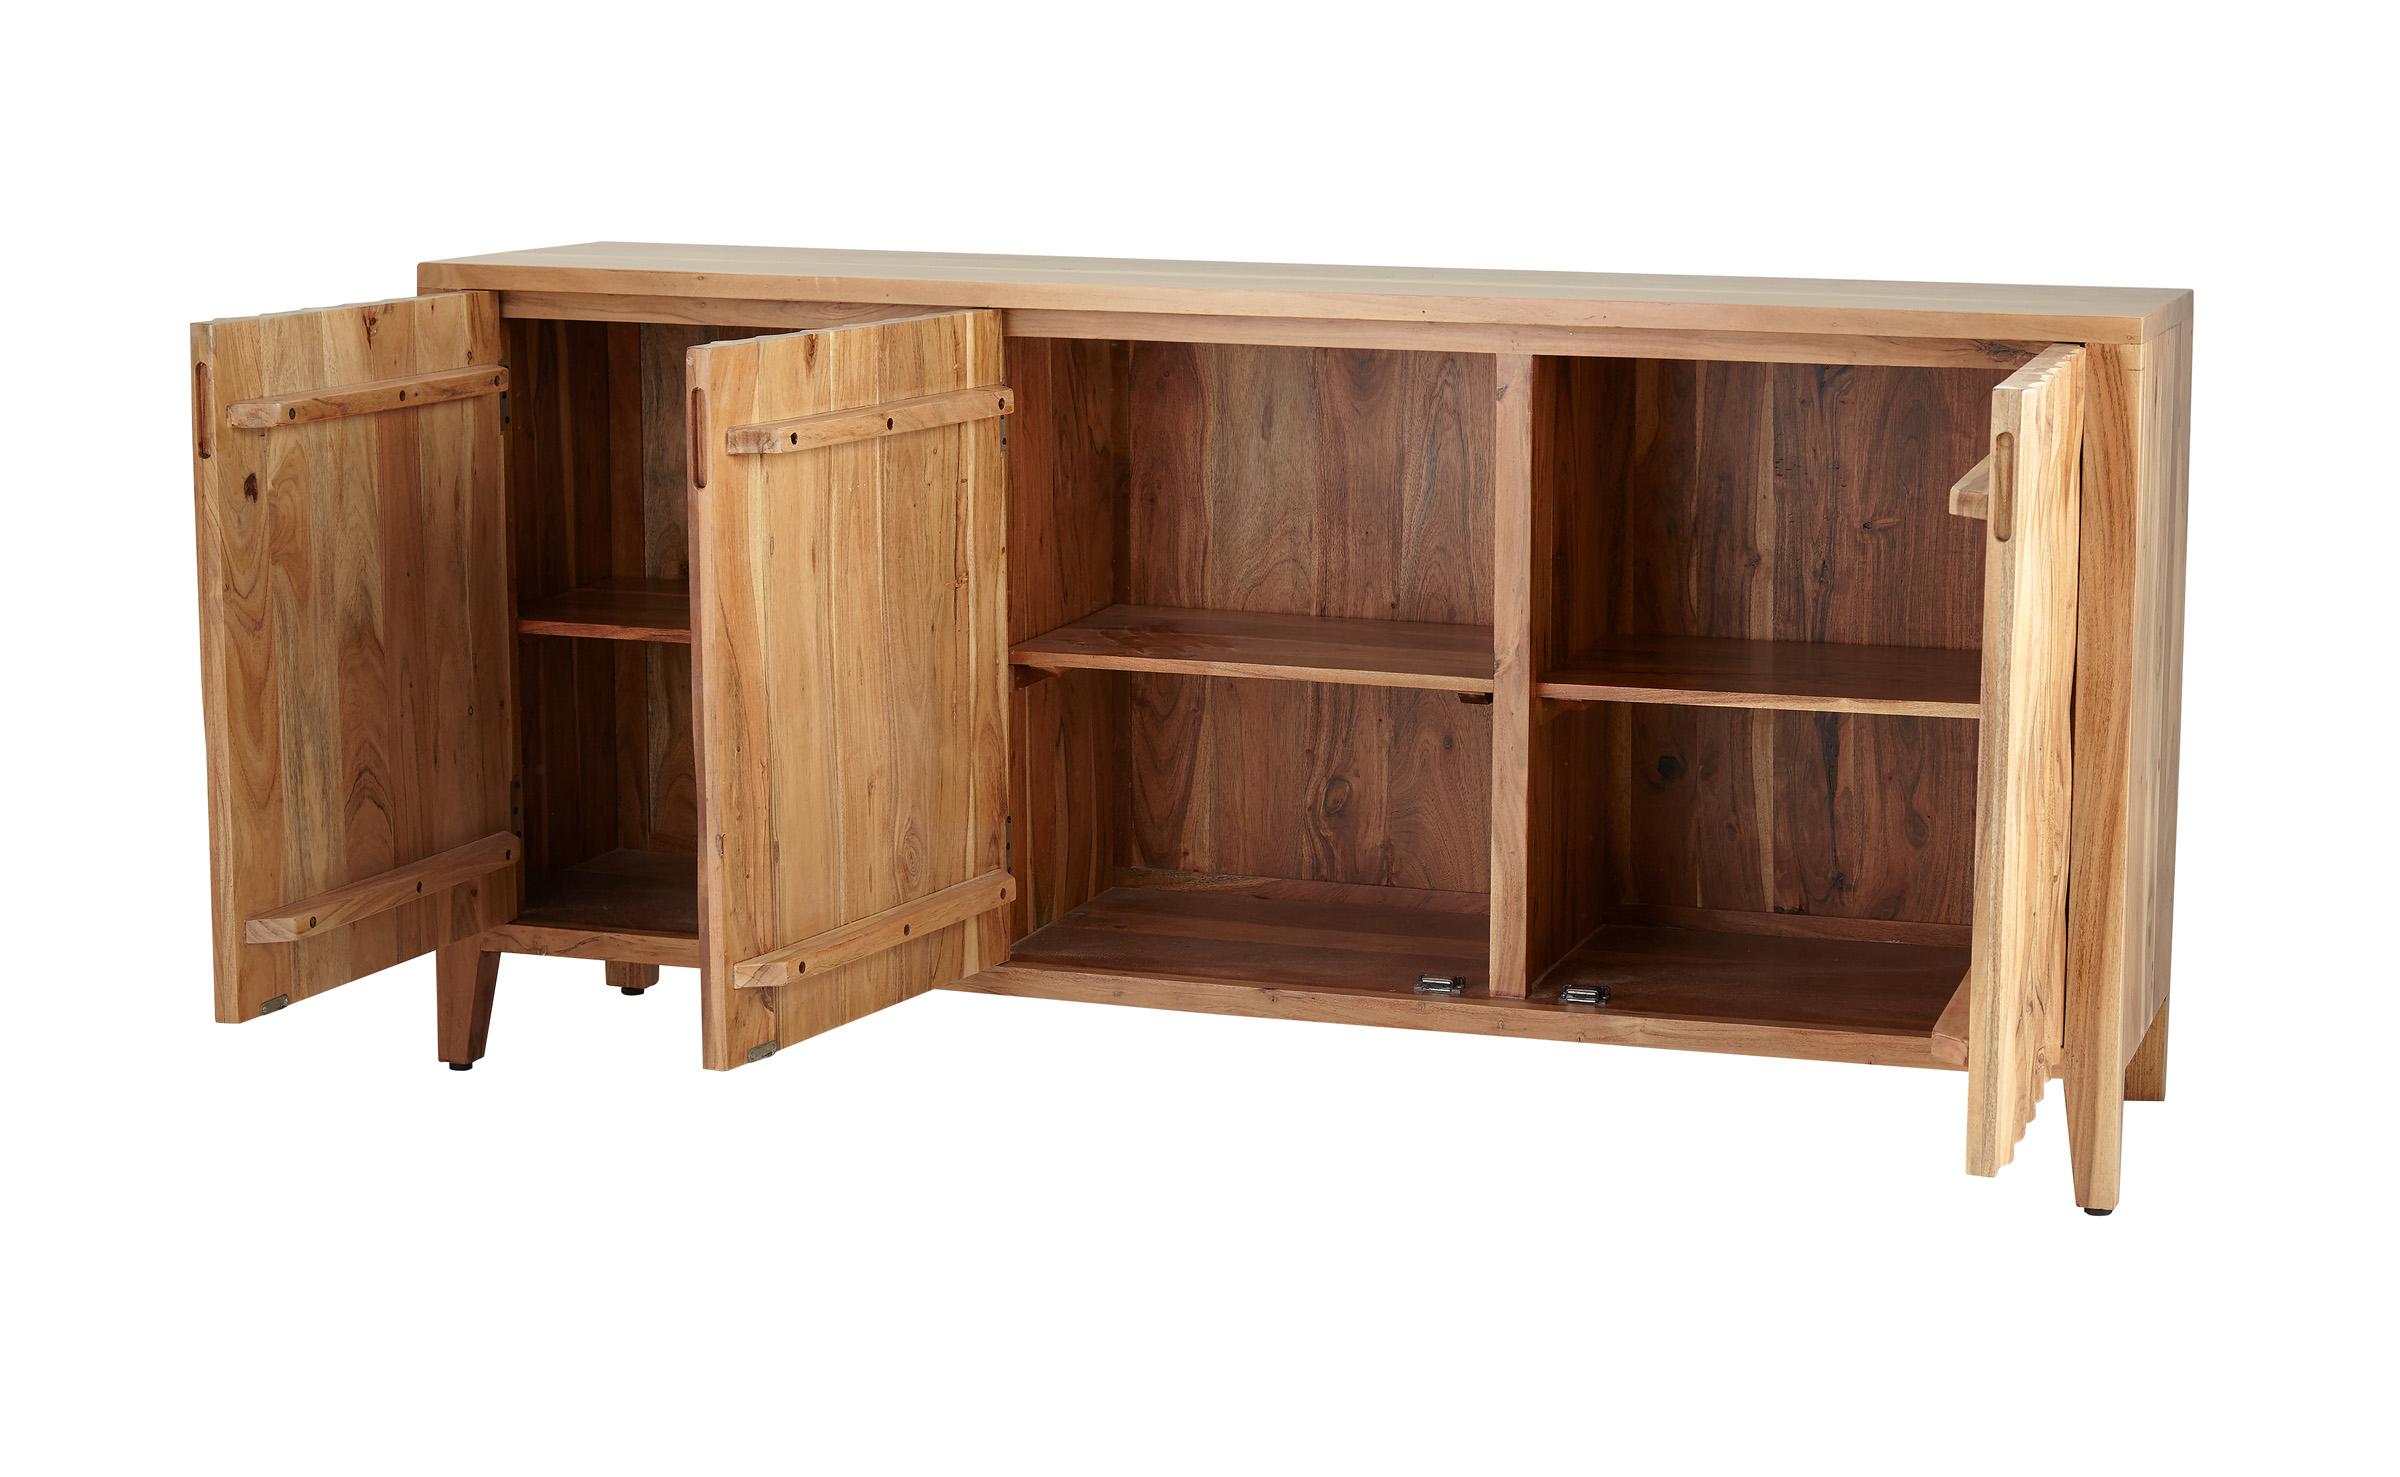 Favorite Decmode Rustic 34 X 72 Inch Brown Wooden Three Door Sideboard In Brown Wood 72 Inch Sideboards (View 5 of 20)